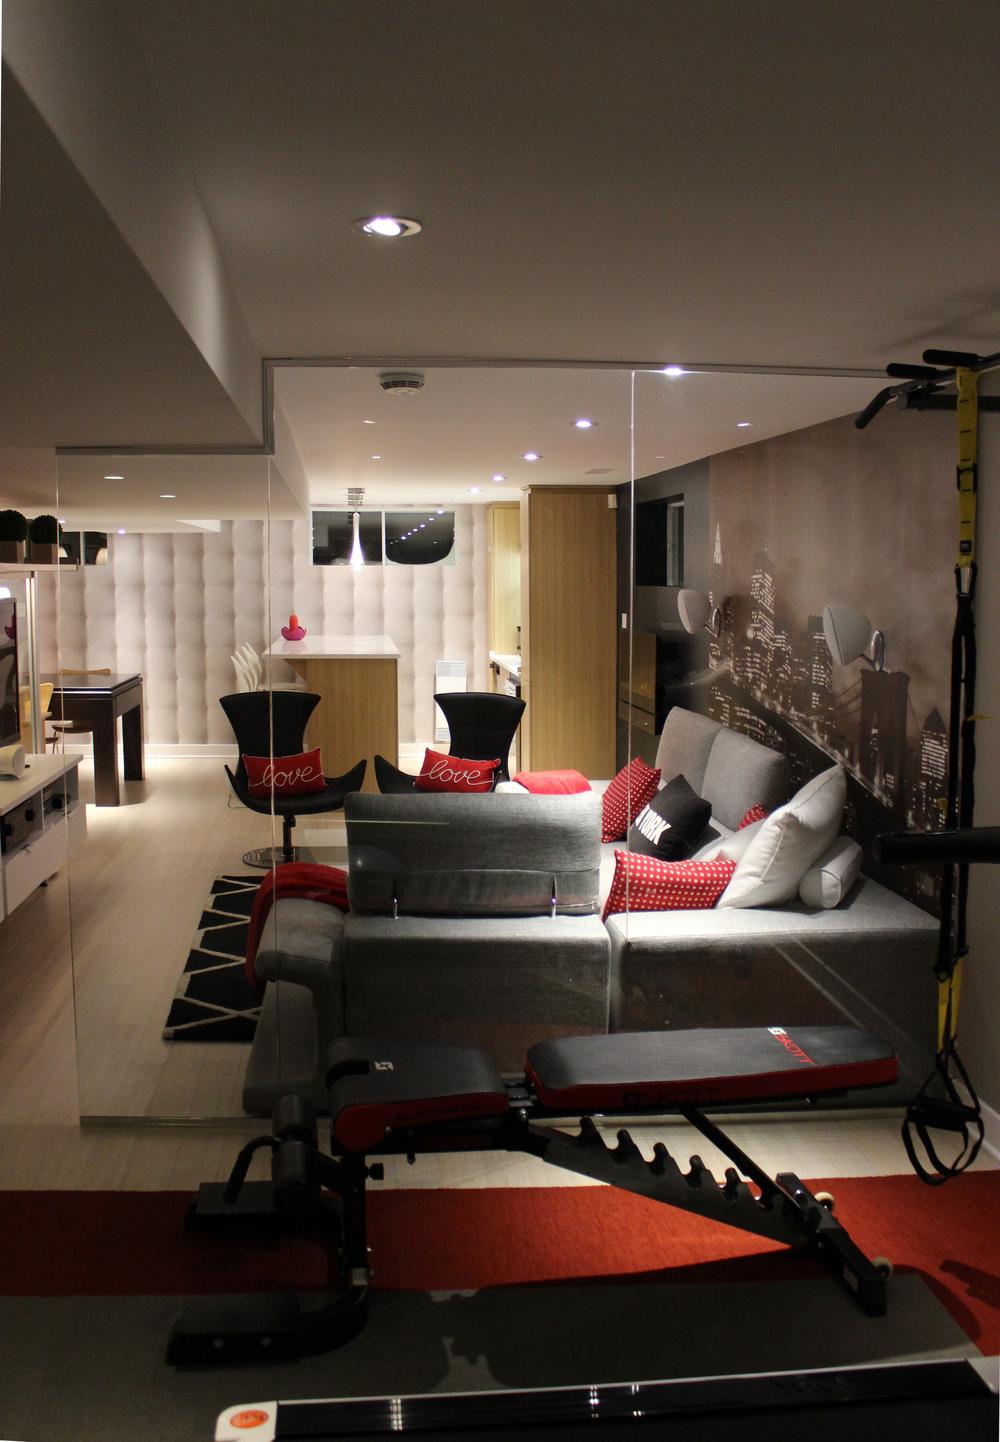 sous sol hotel moderne studio bohema design architecture d 39 int rieur. Black Bedroom Furniture Sets. Home Design Ideas